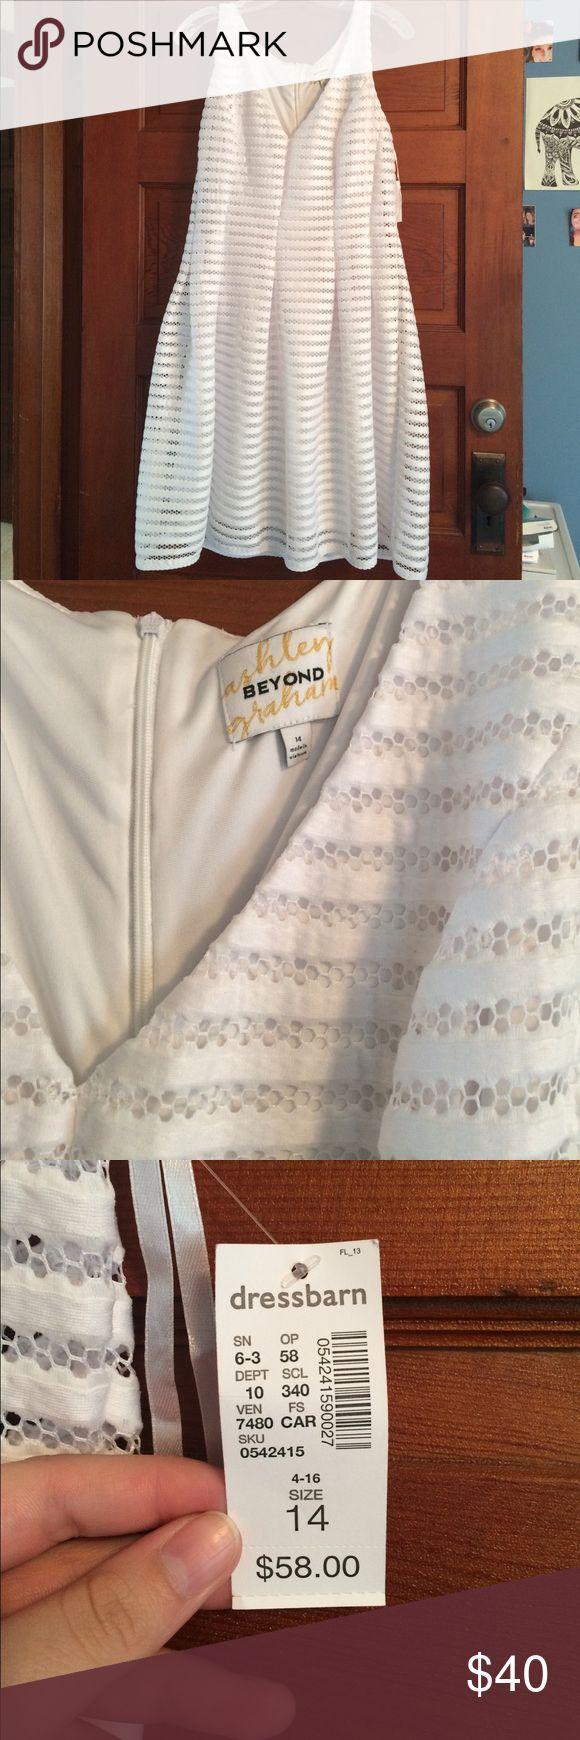 Ashley Graham White Dress White dress. Never worn! Still has tags. No stains. Ashley Graham Dresses Midi